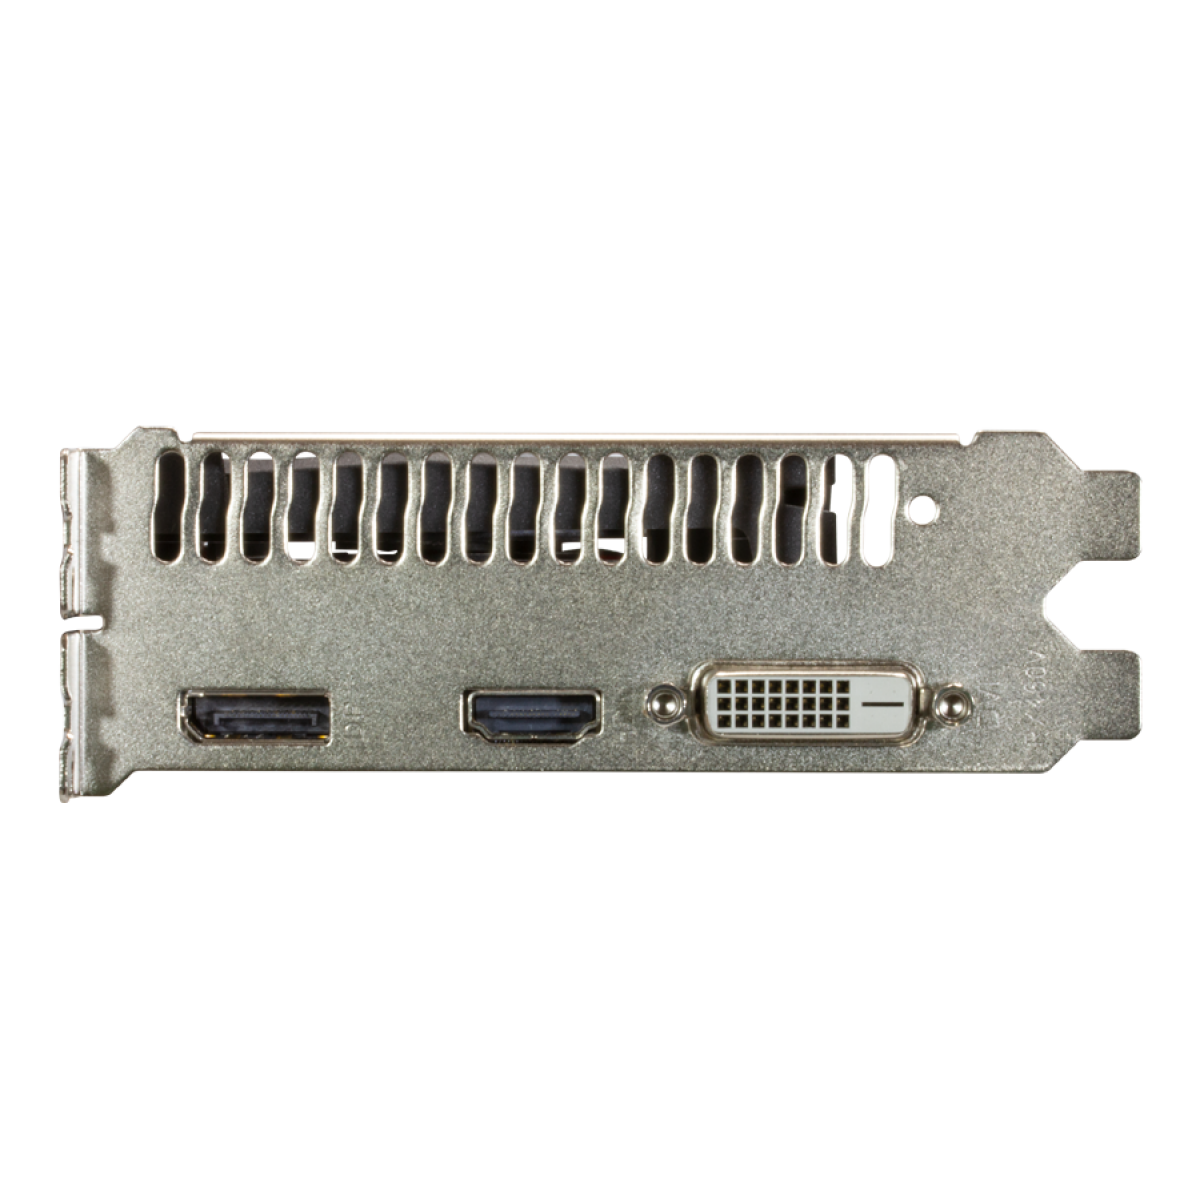 Placa de Vídeo PowerColor, Radeon, RX 550 Red Dragon, 2GB, GDDR5, 128Bit, AXRX 550 2GBD5-DH